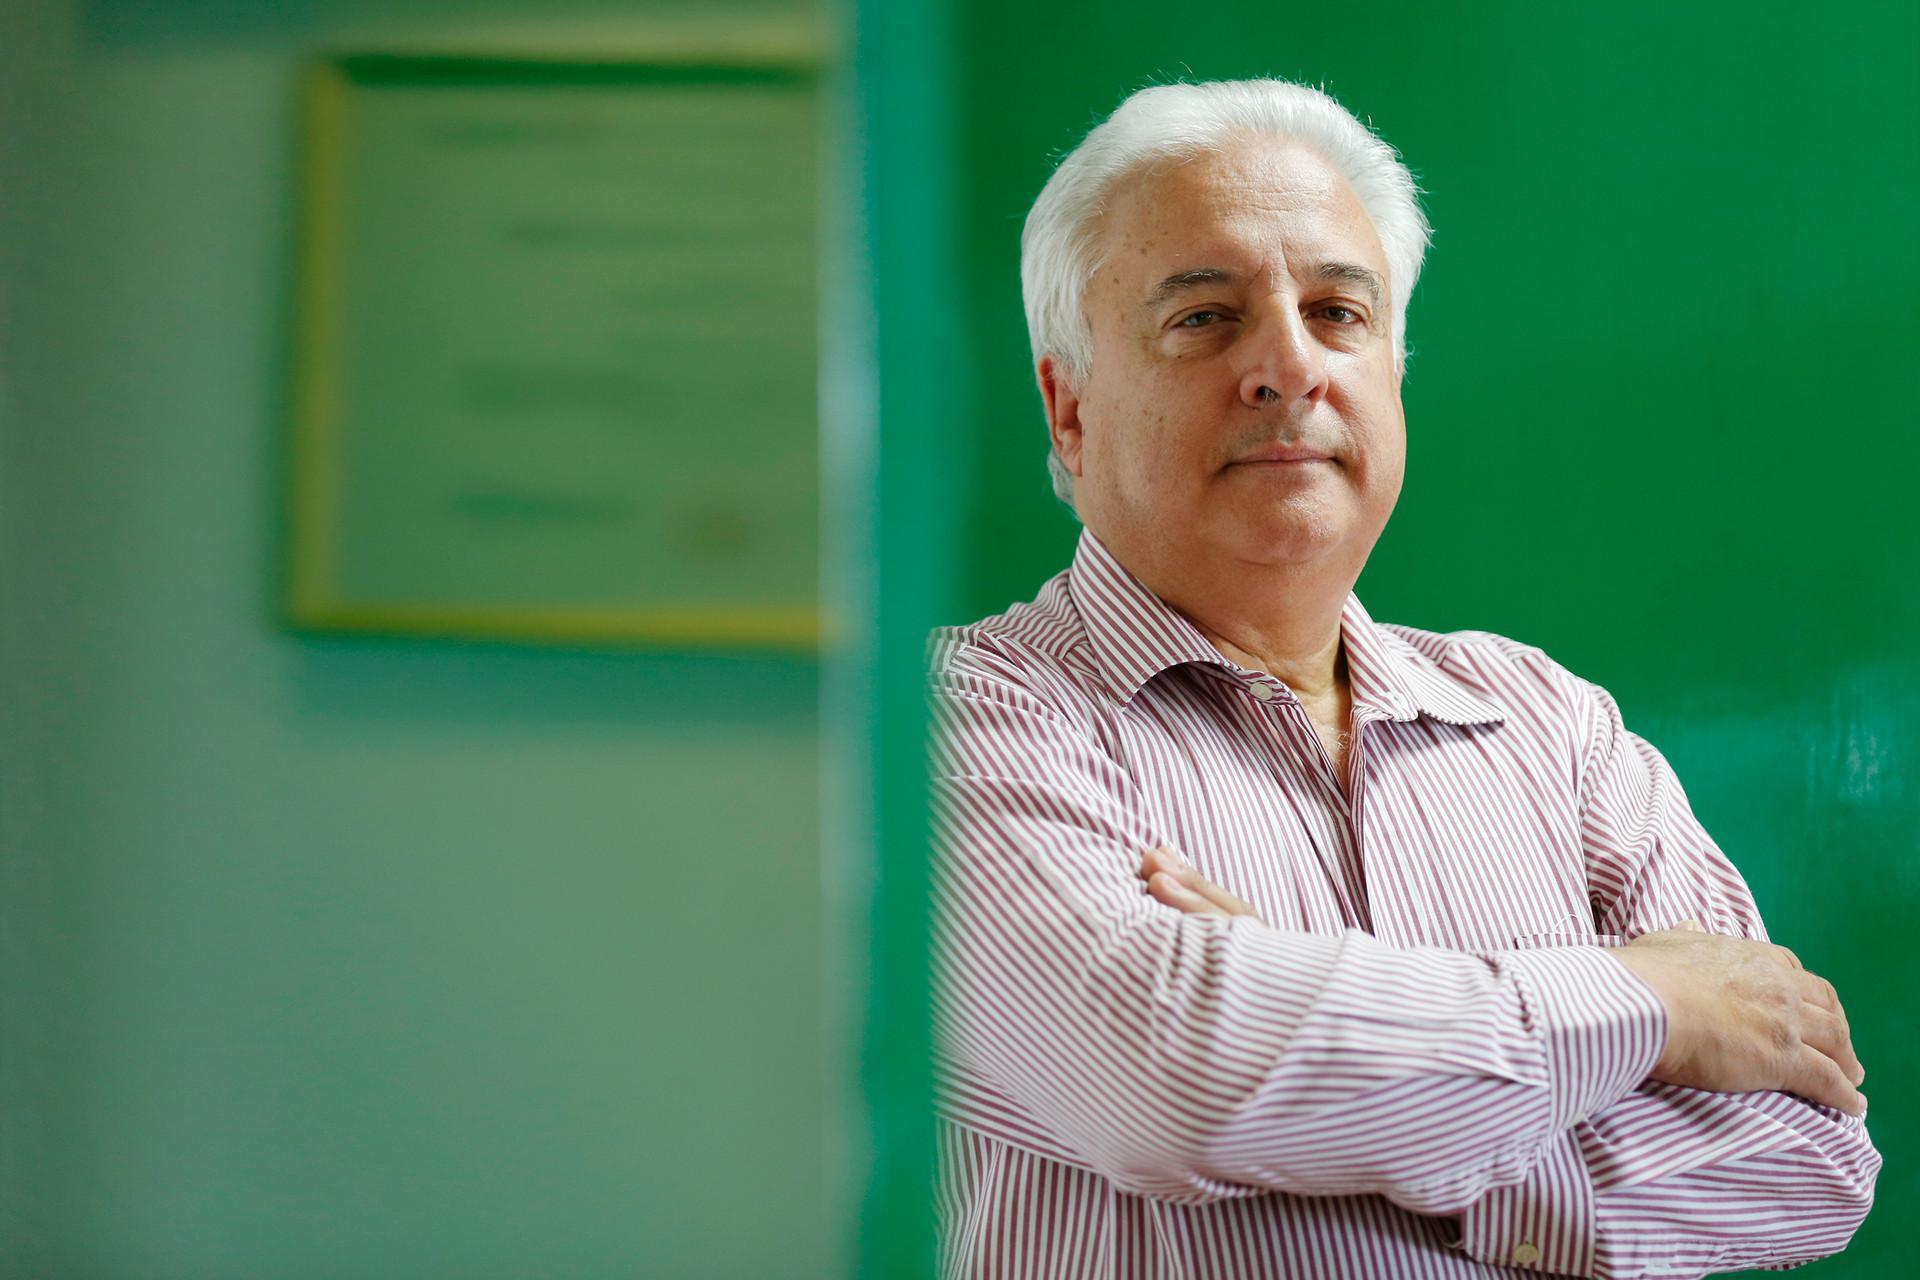 José Manuel Nunes Salvador Tribolet